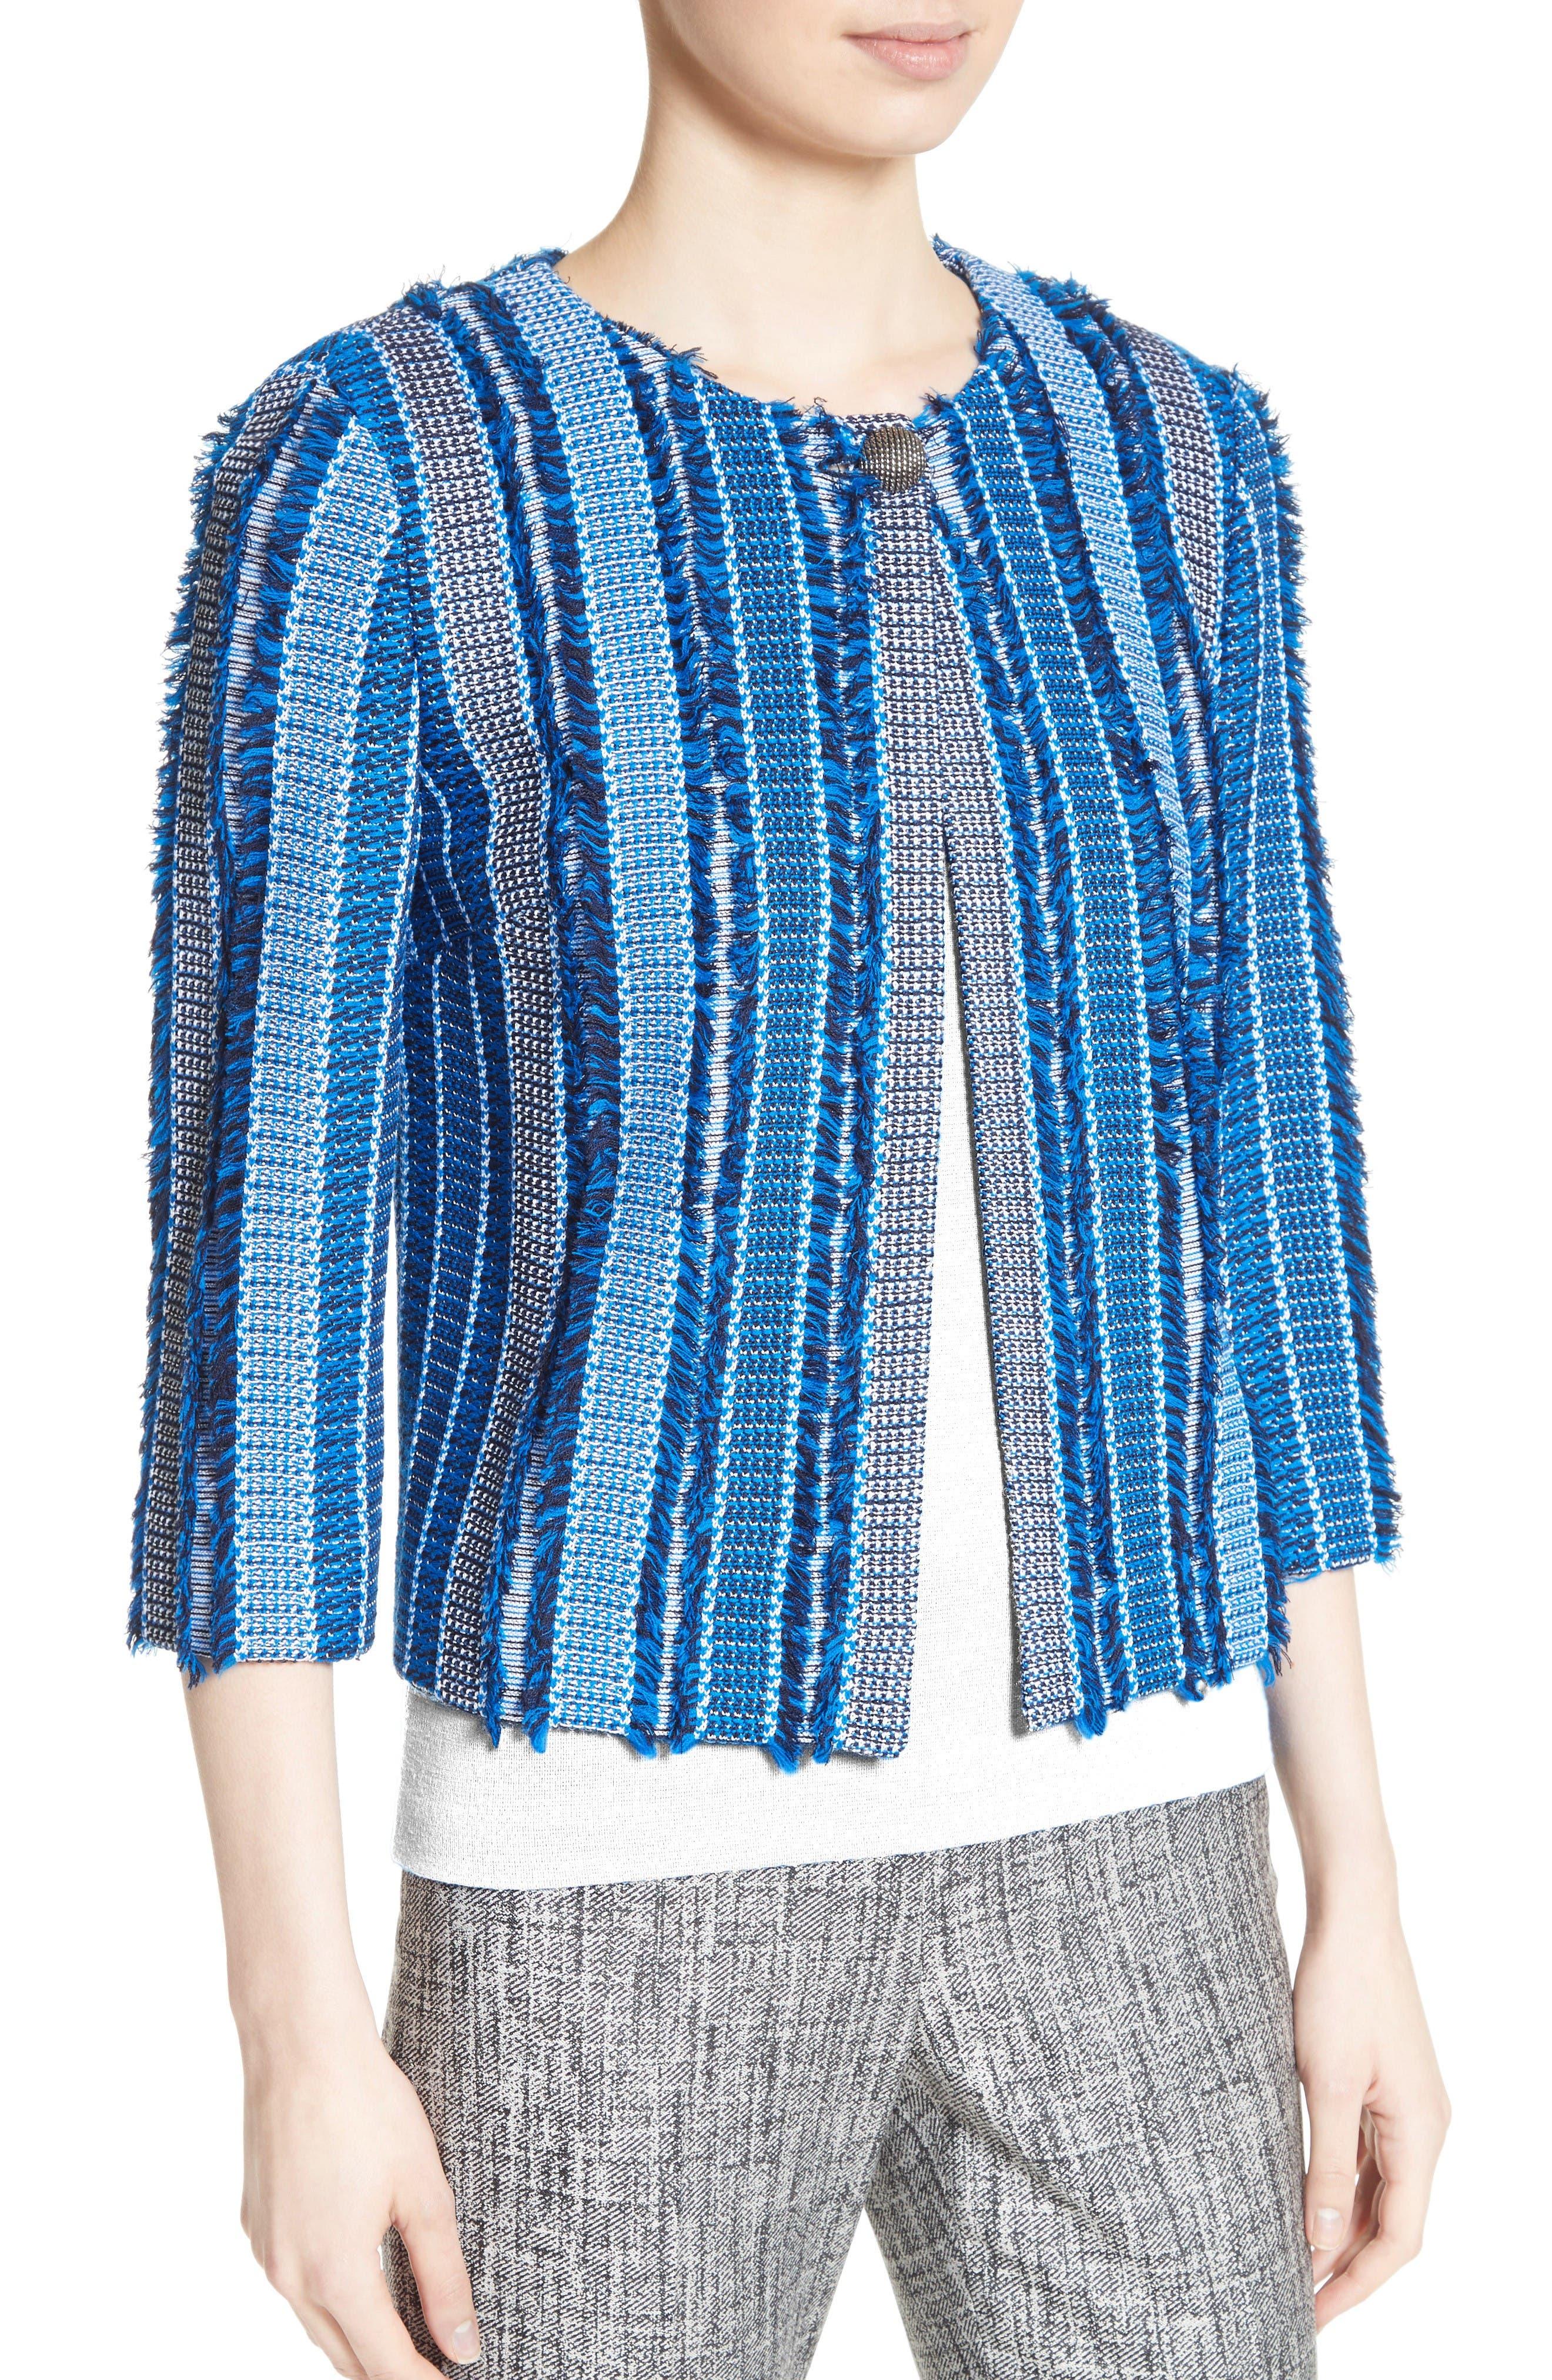 Damik Fil Coupé Knit Jacket,                             Alternate thumbnail 4, color,                             Jaya Blue Multi